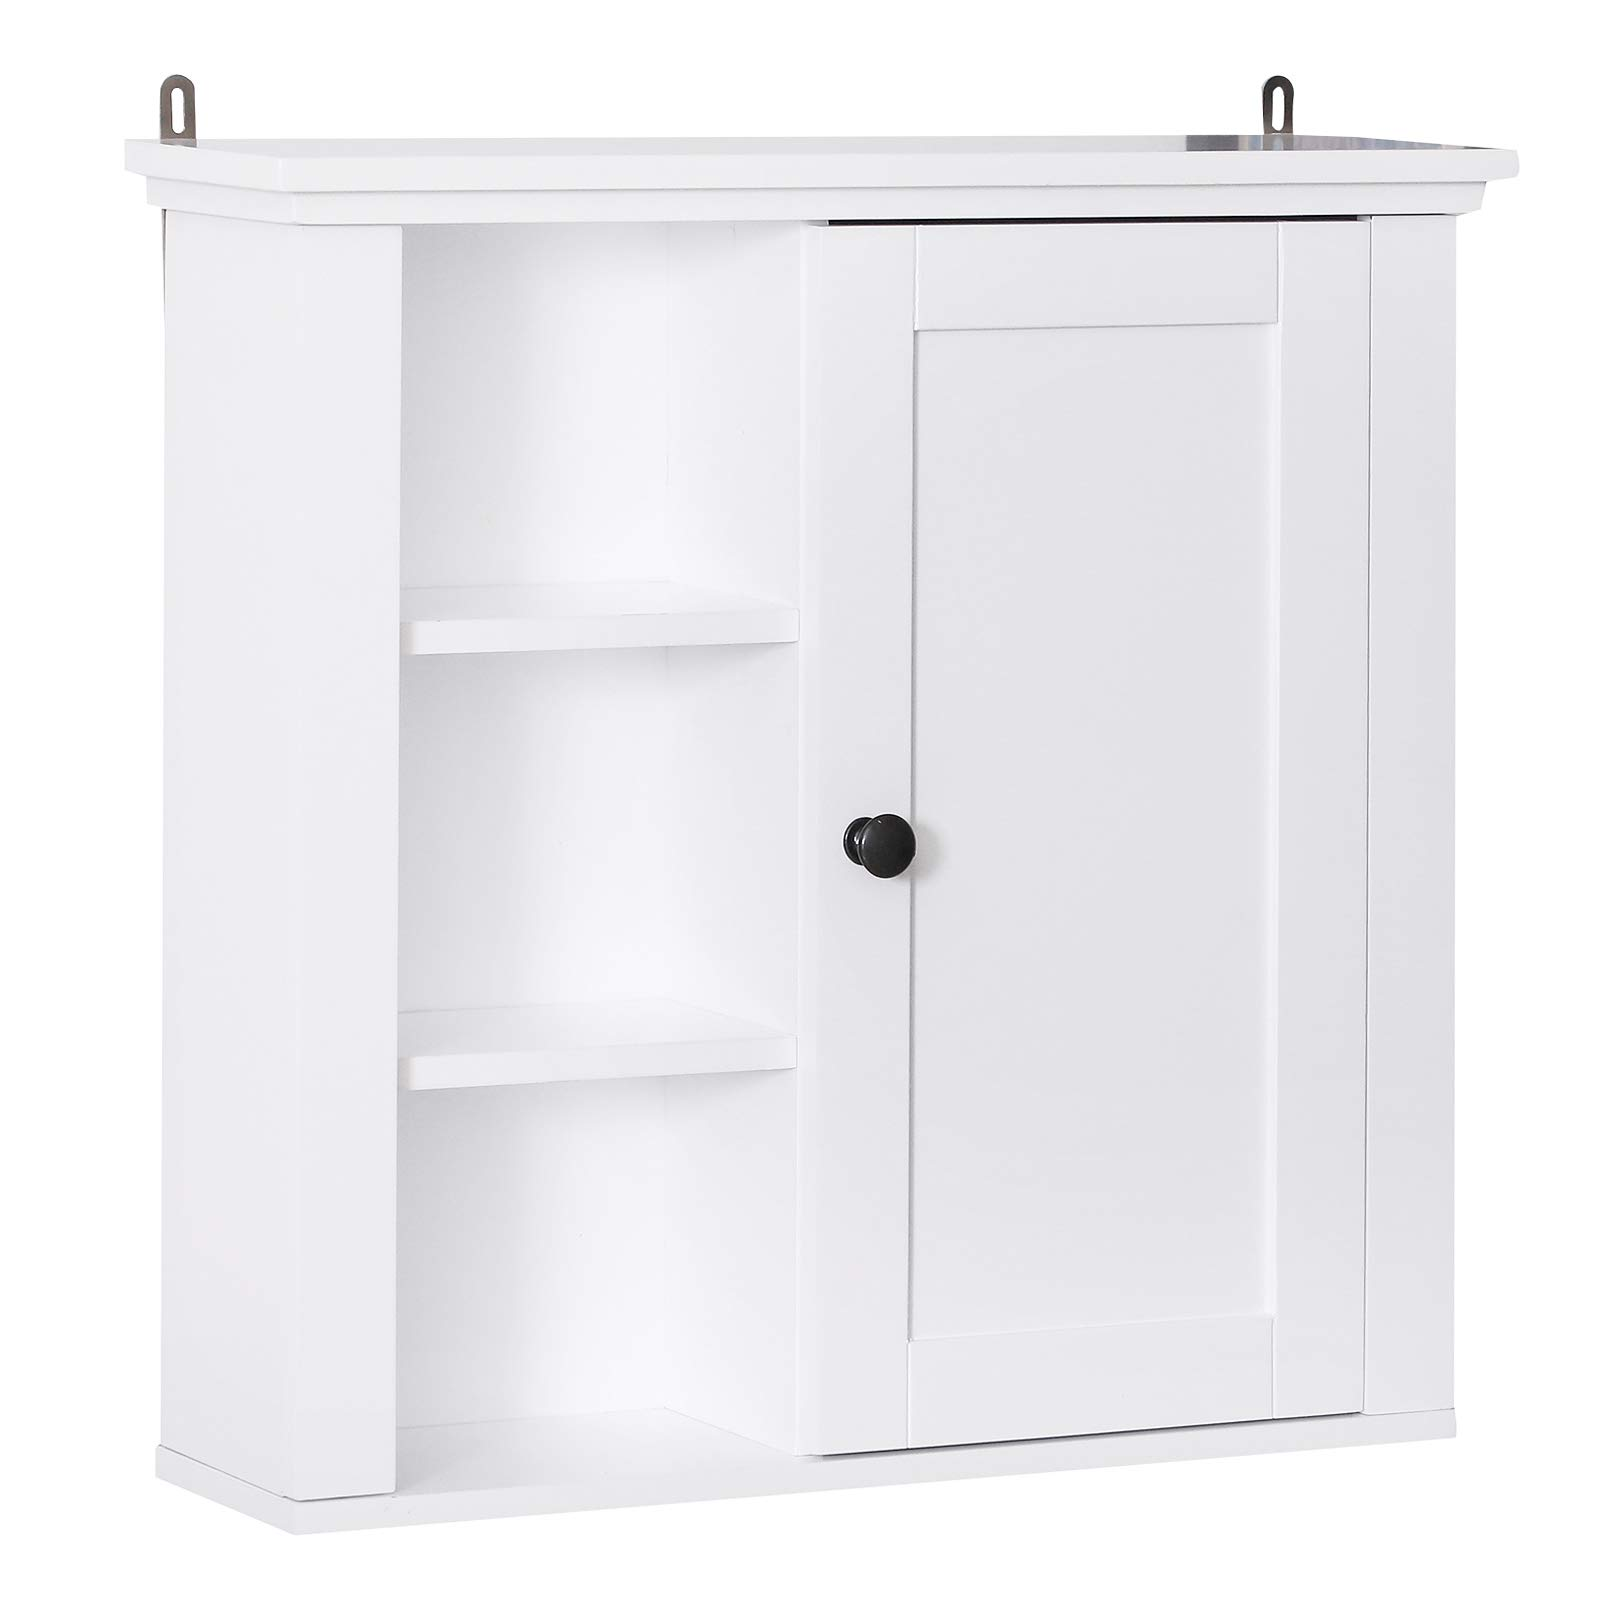 HOMCOM 21'' Wood Wall Mount Bathroom Linen Storage Cabinet - White by HOMCOM